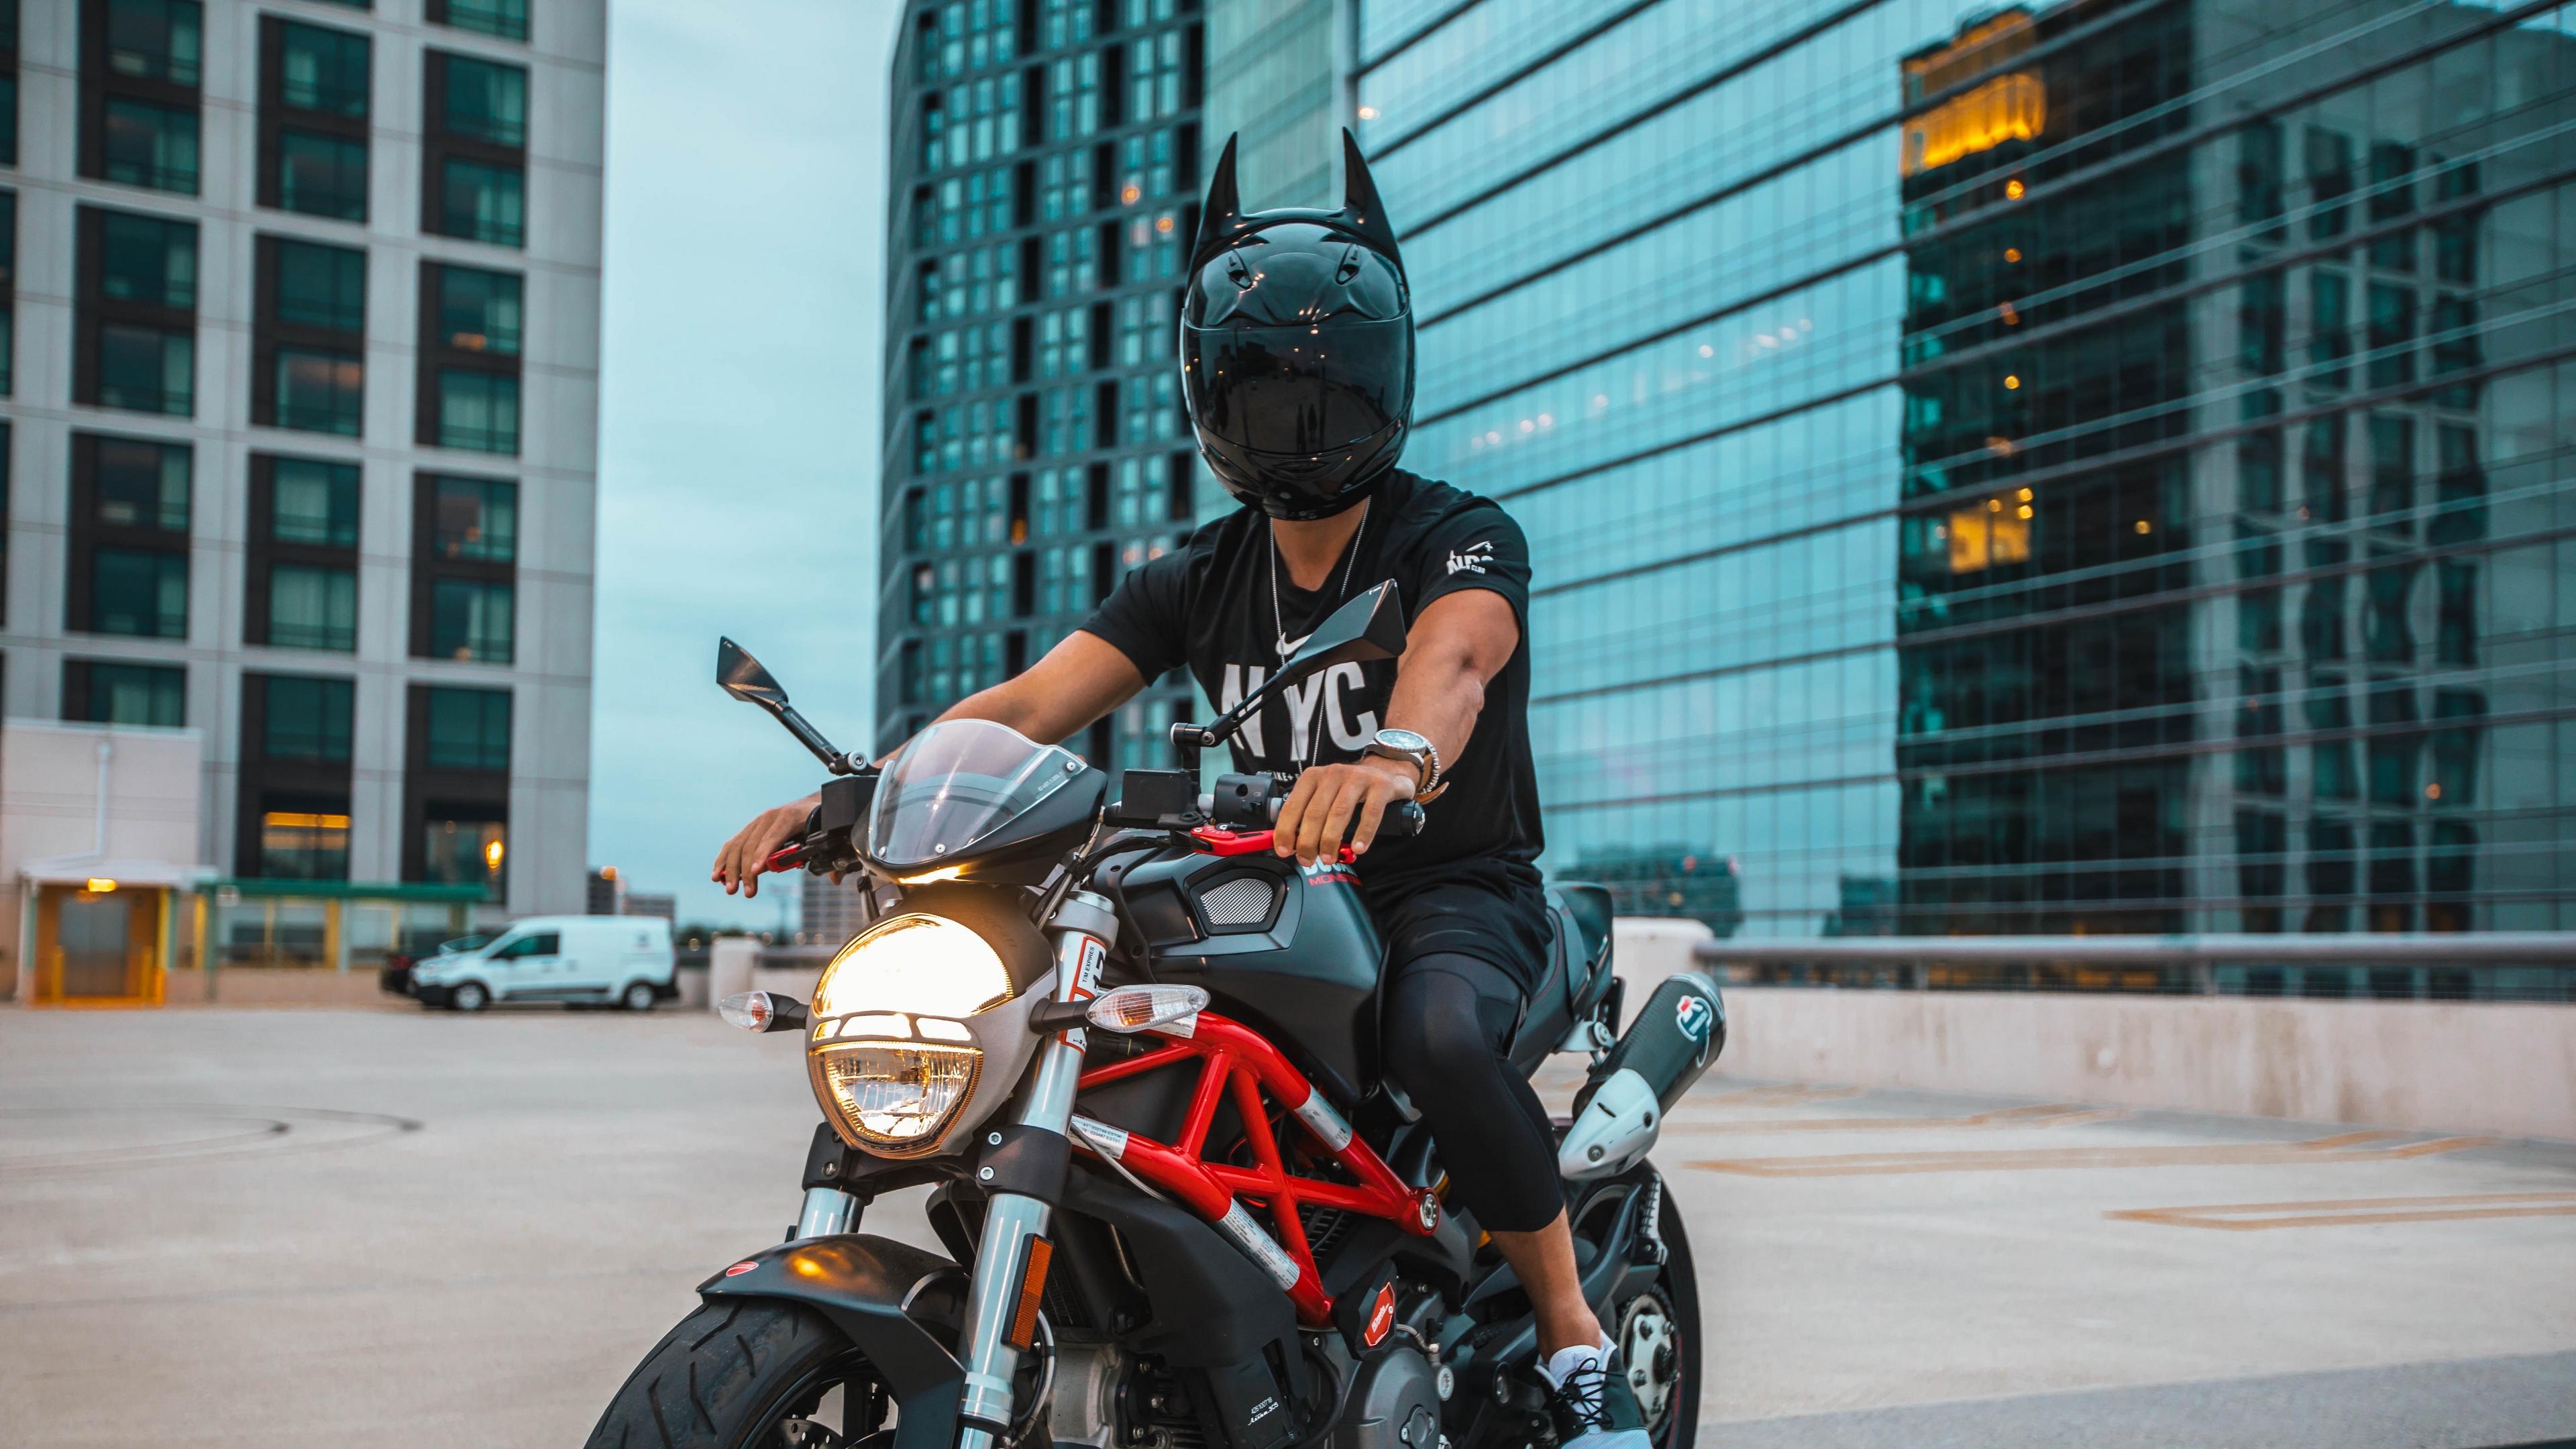 motorcyclist motorcycle helmet man 4k 1536018335 - motorcyclist, motorcycle, helmet, man 4k - motorcyclist, Motorcycle, helmet